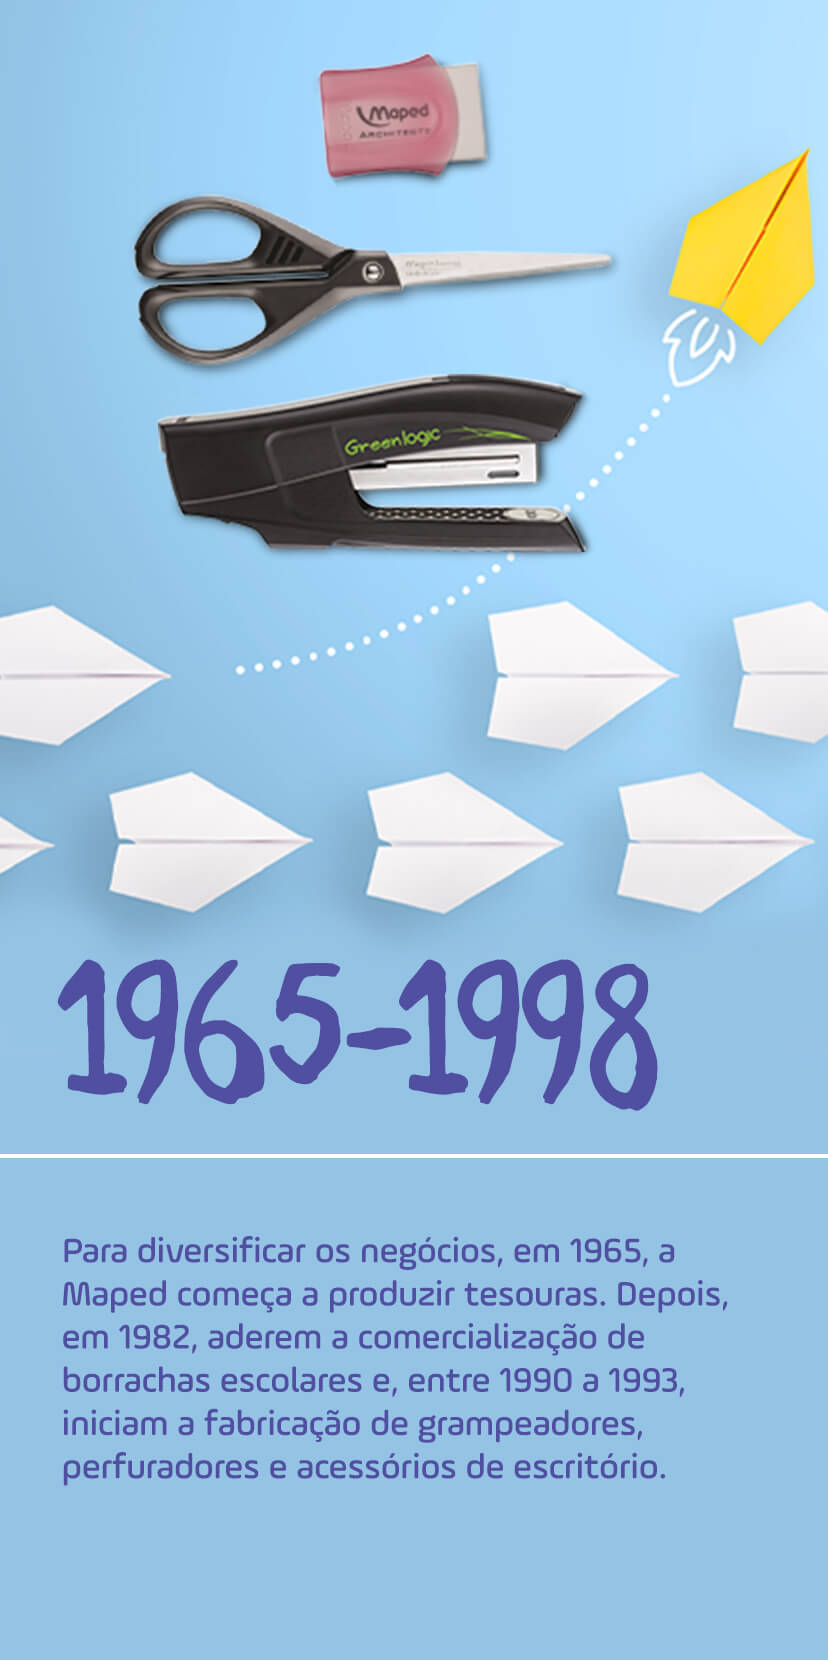 03 mobile 1965 1998